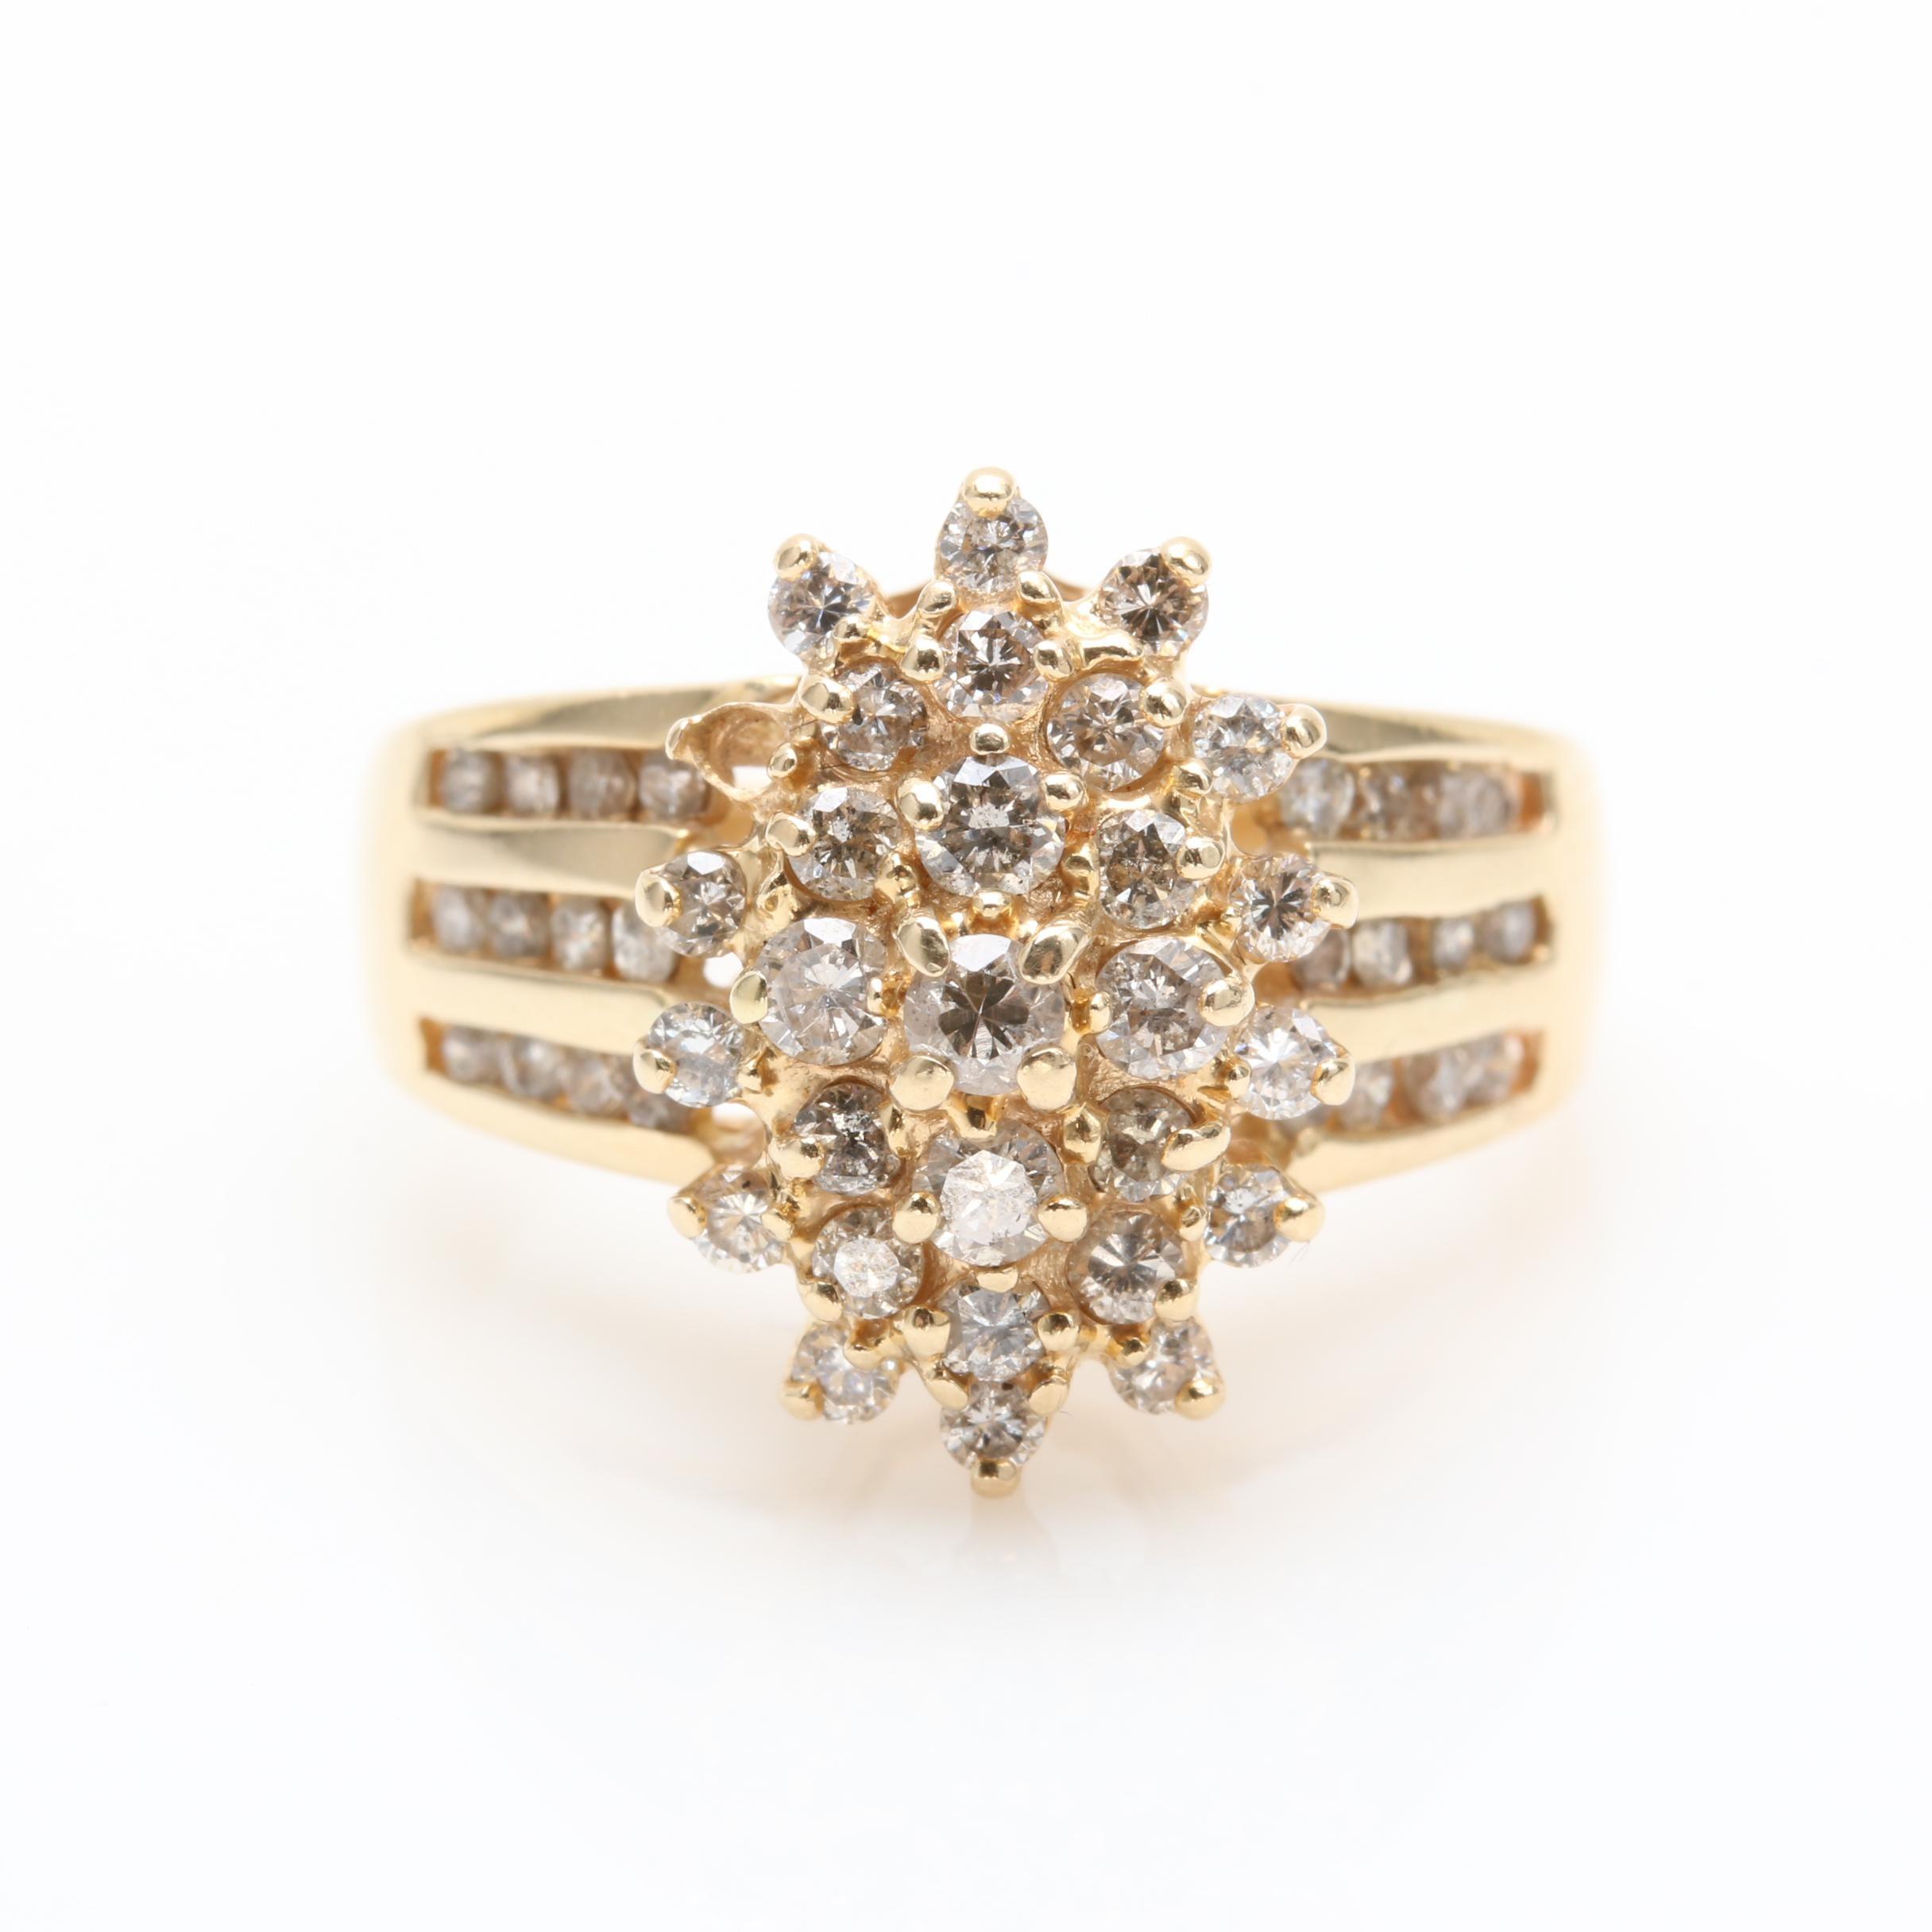 14K Yellow Gold 0.96 CTW Diamond Ring